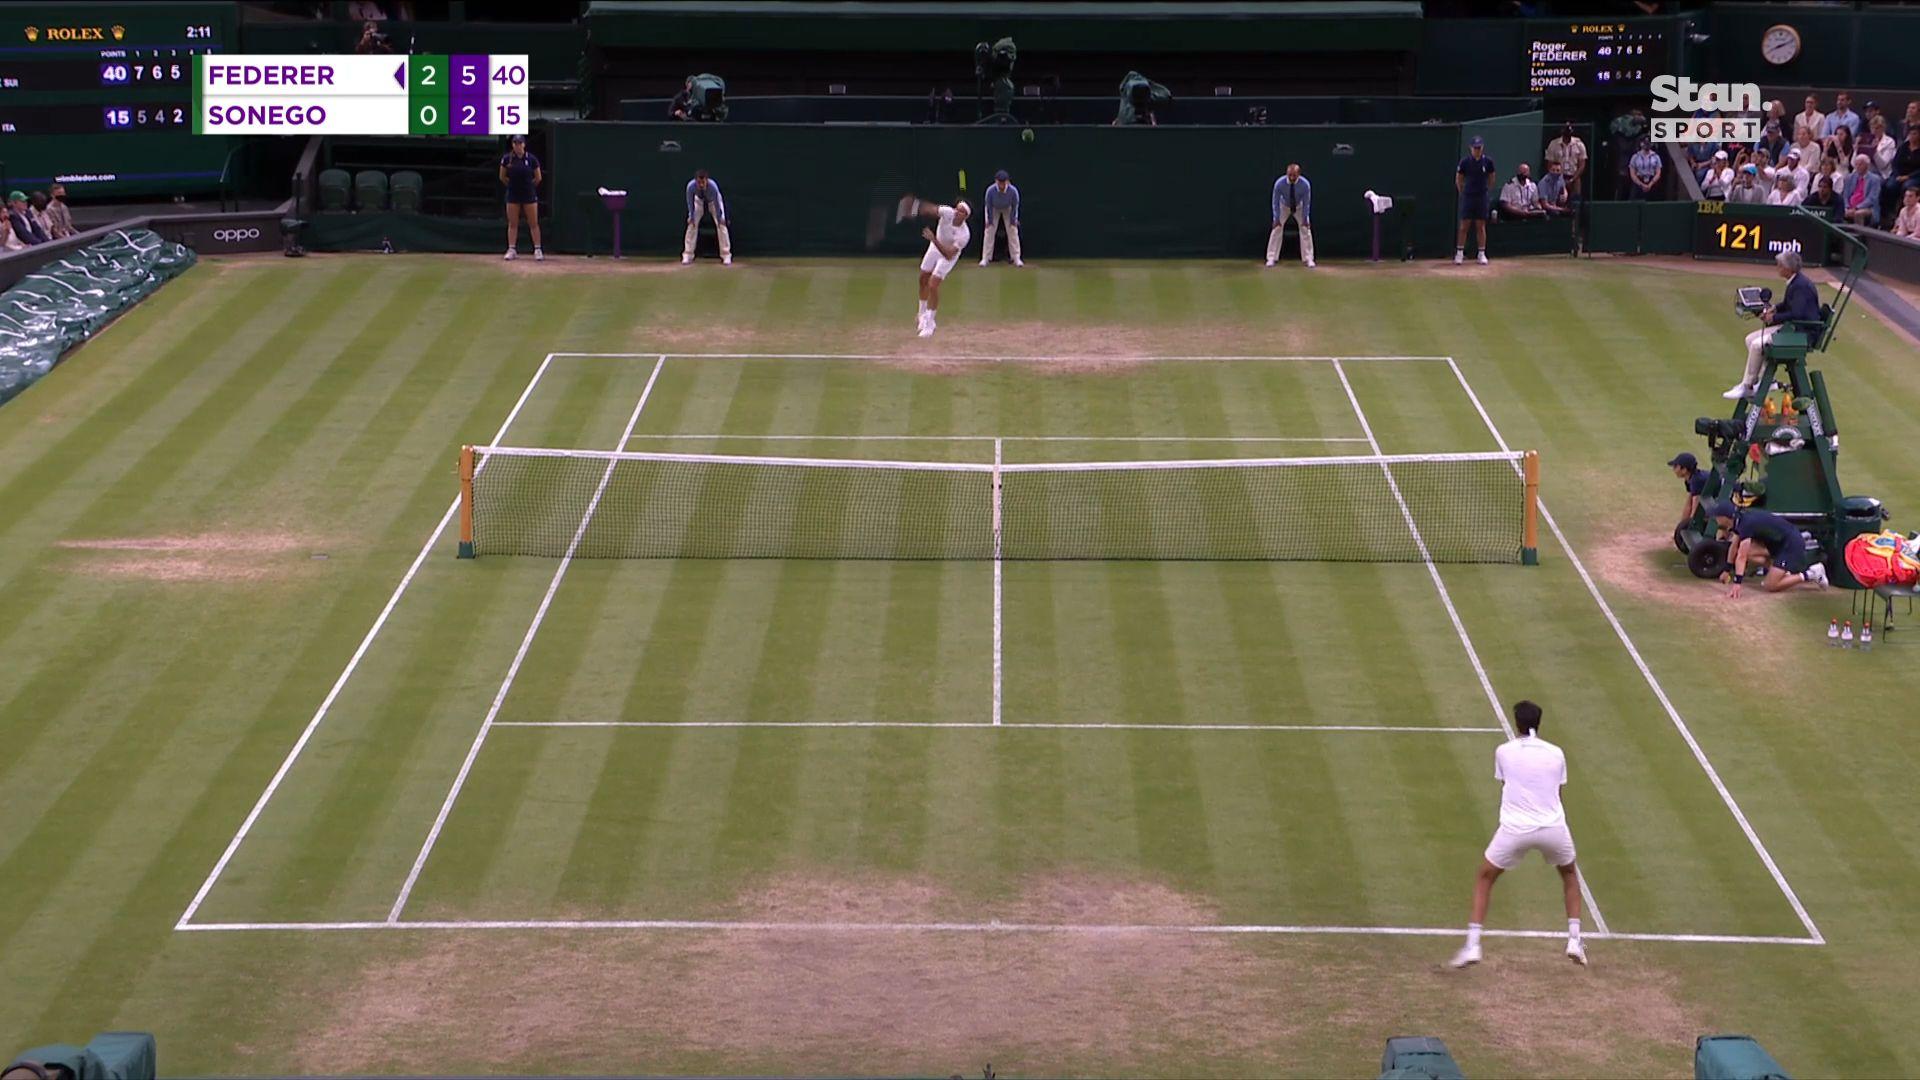 Citing knee, Roger Federer out of Toronto, Cincinnati tournaments